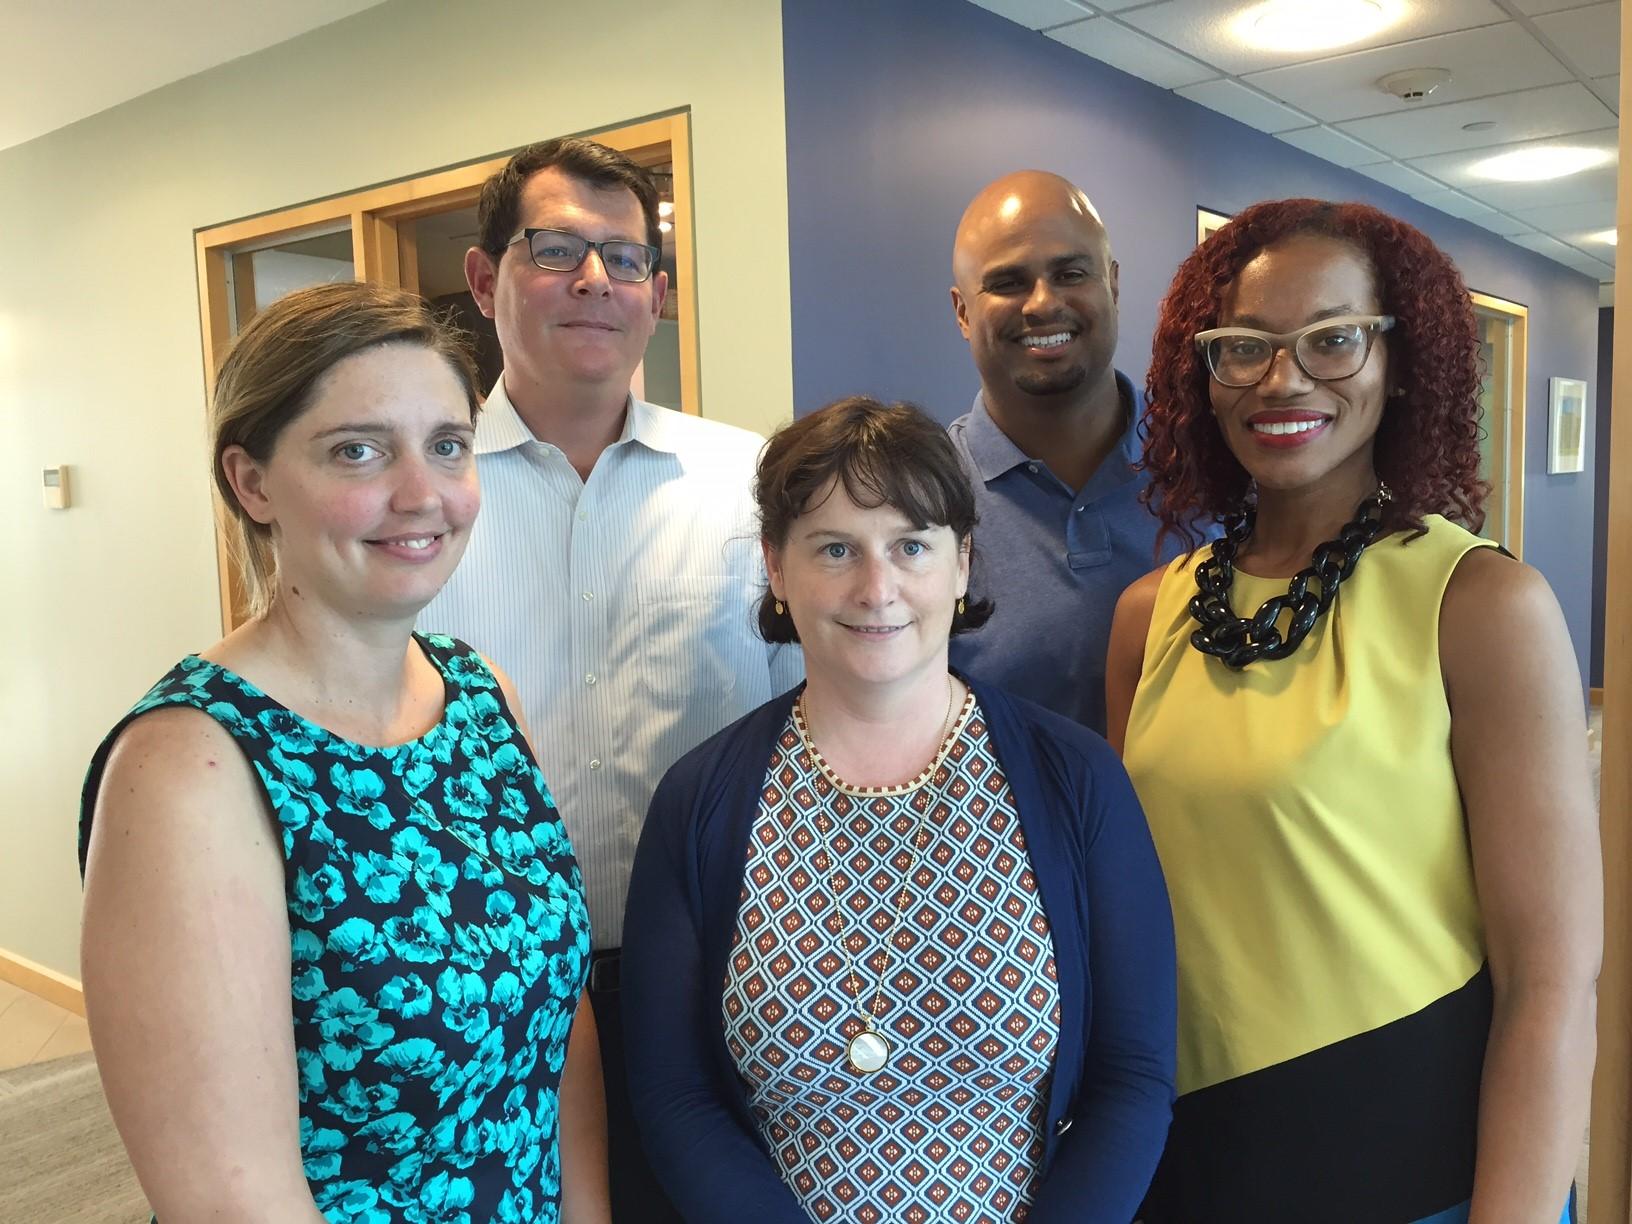 Webcasts promote captive insurance in Bermuda